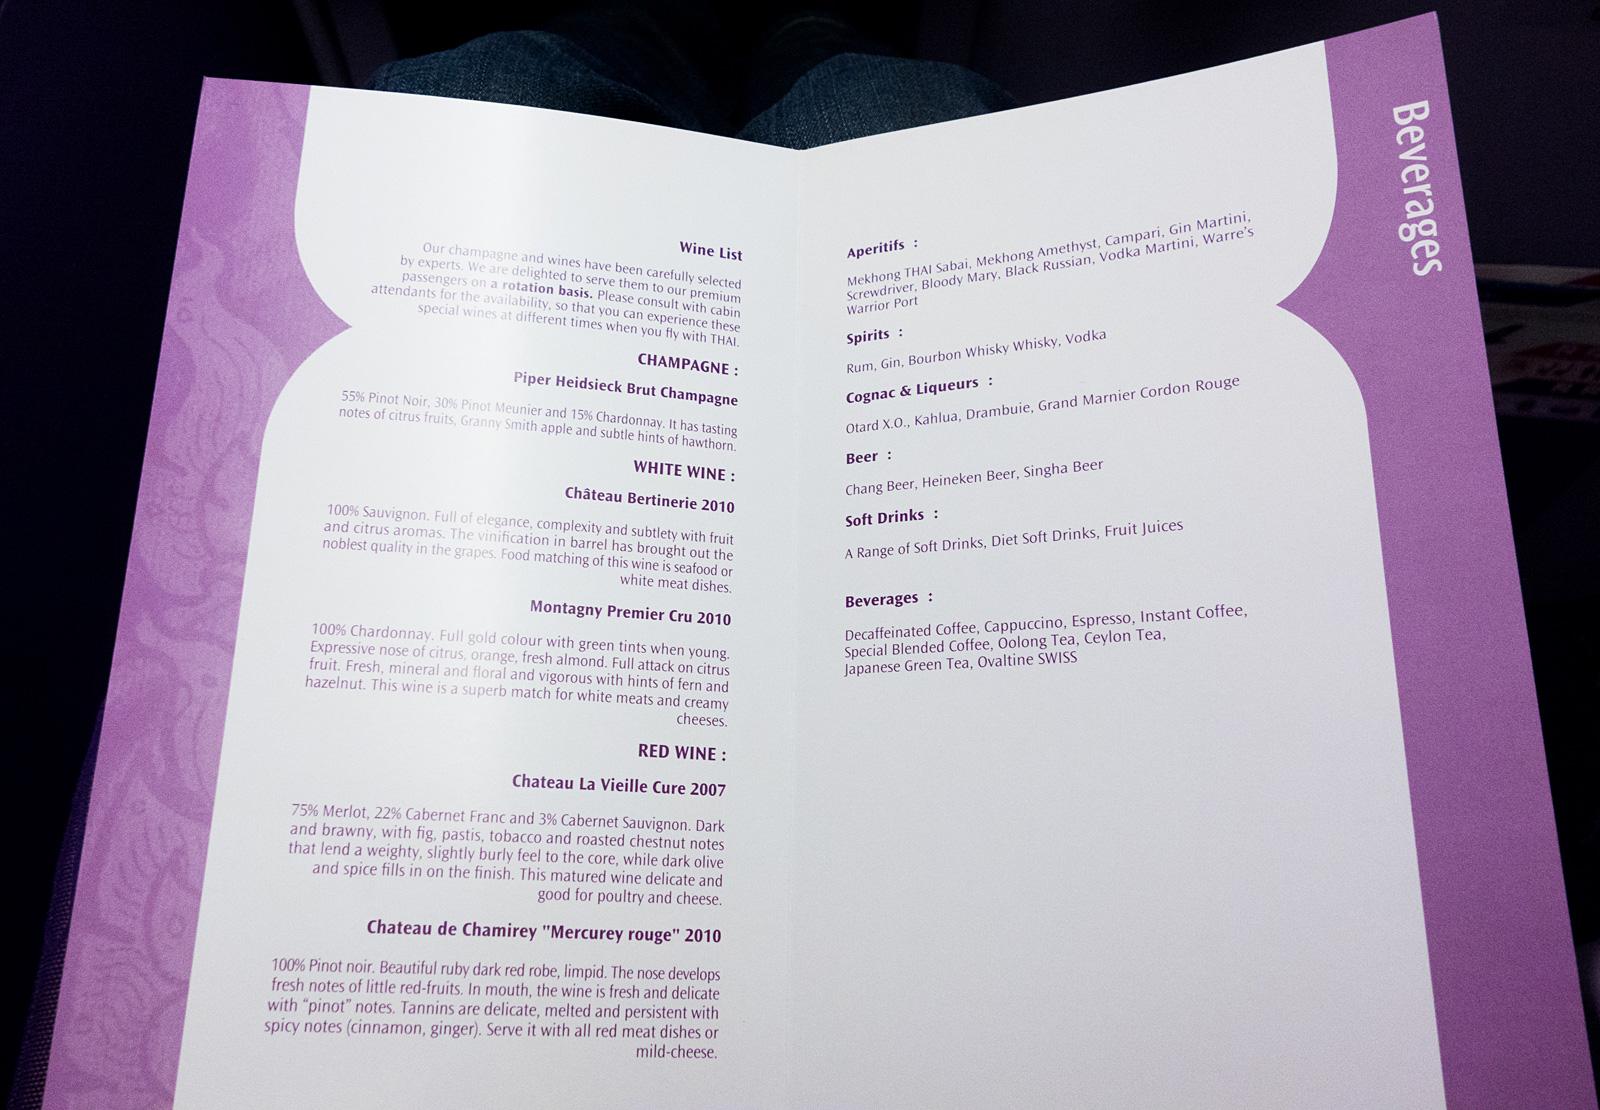 Thomson Inflight Meals >> Thai Airways A380: Royal Silk Business Class | bart.la